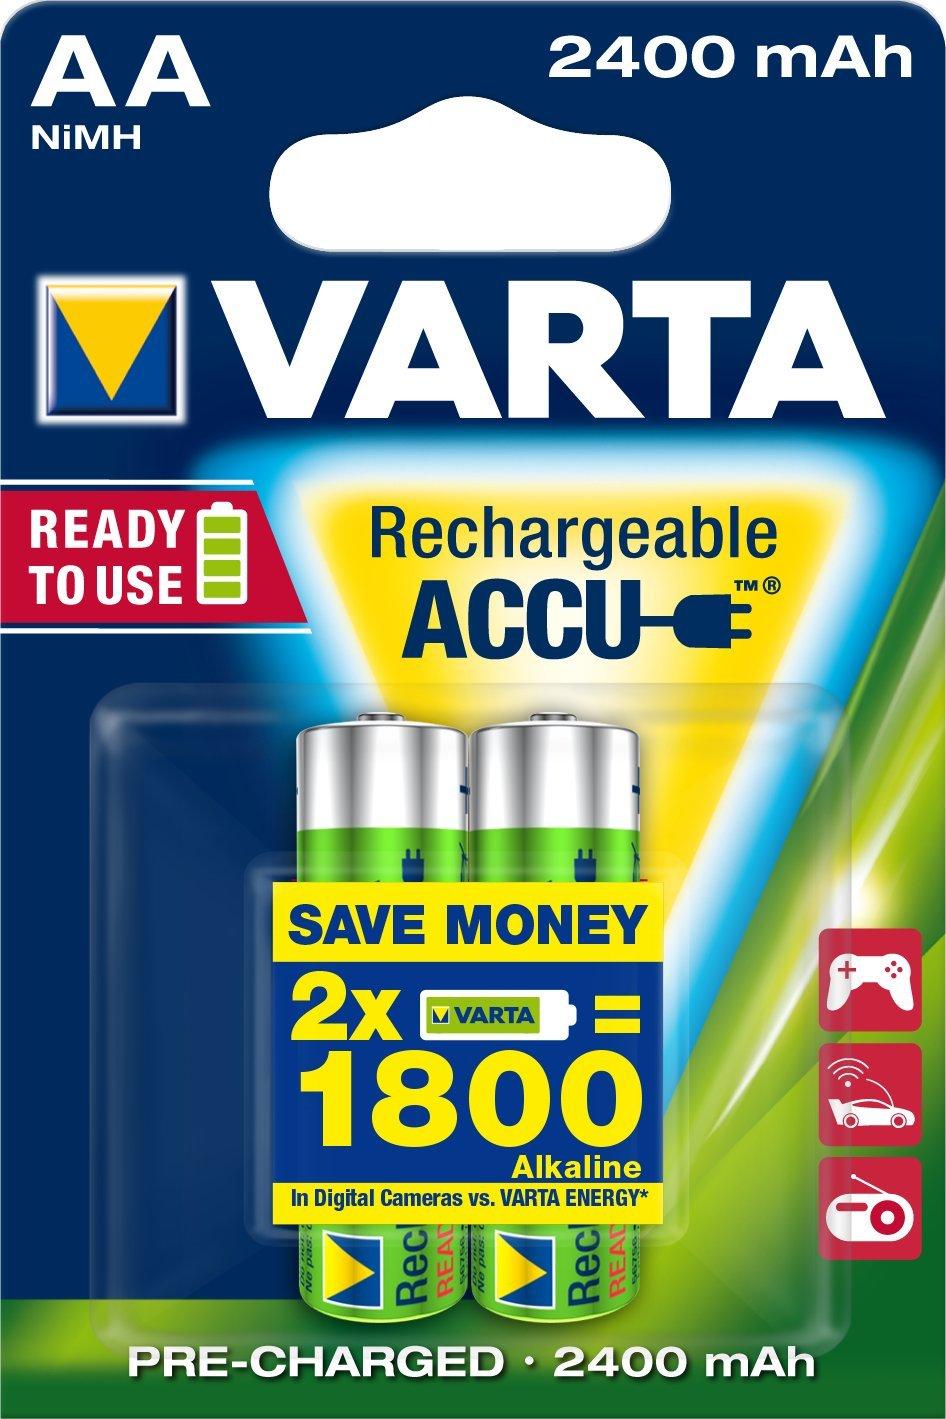 Varta ACCU Batteria Ricaricabile AA Stilo, 2400 mAh, Confezione da 2 Pezzi